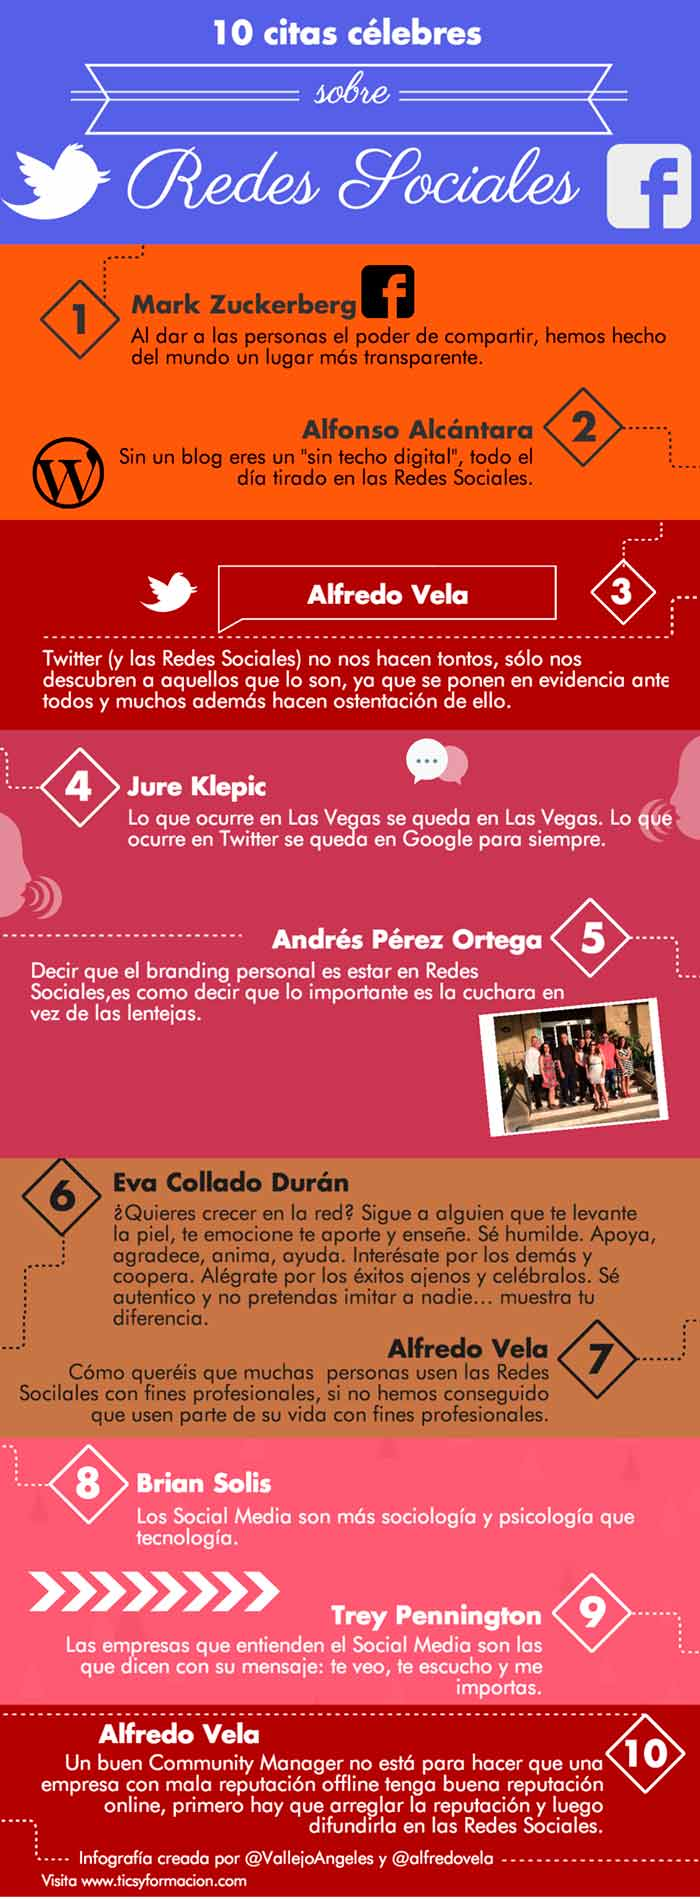 Infografia sobre las 10 citas celebres sobre redes sociales